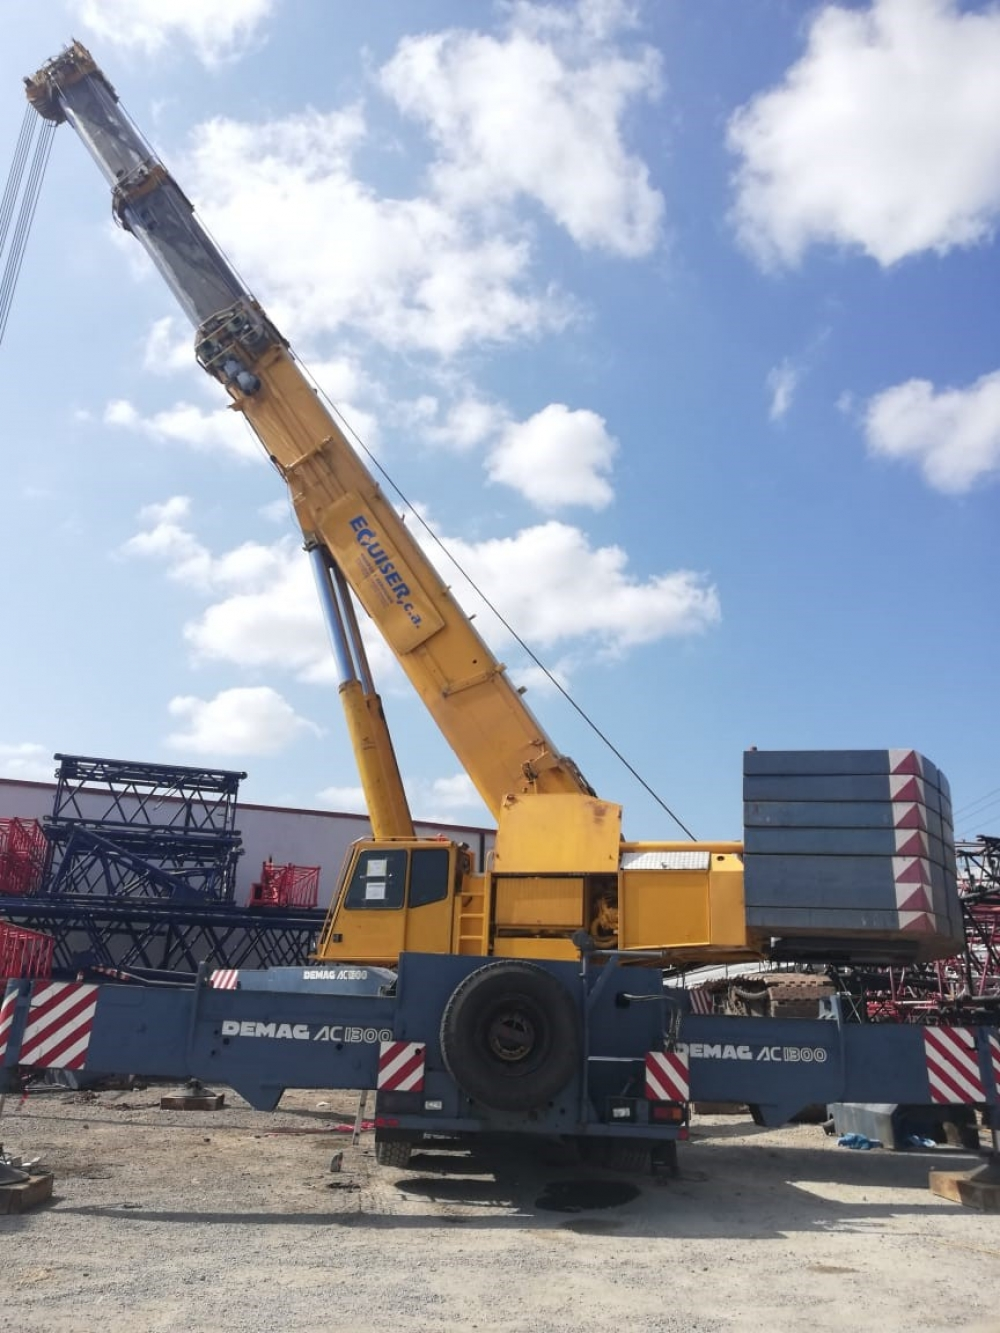 Demag AC1300 Crane image 3